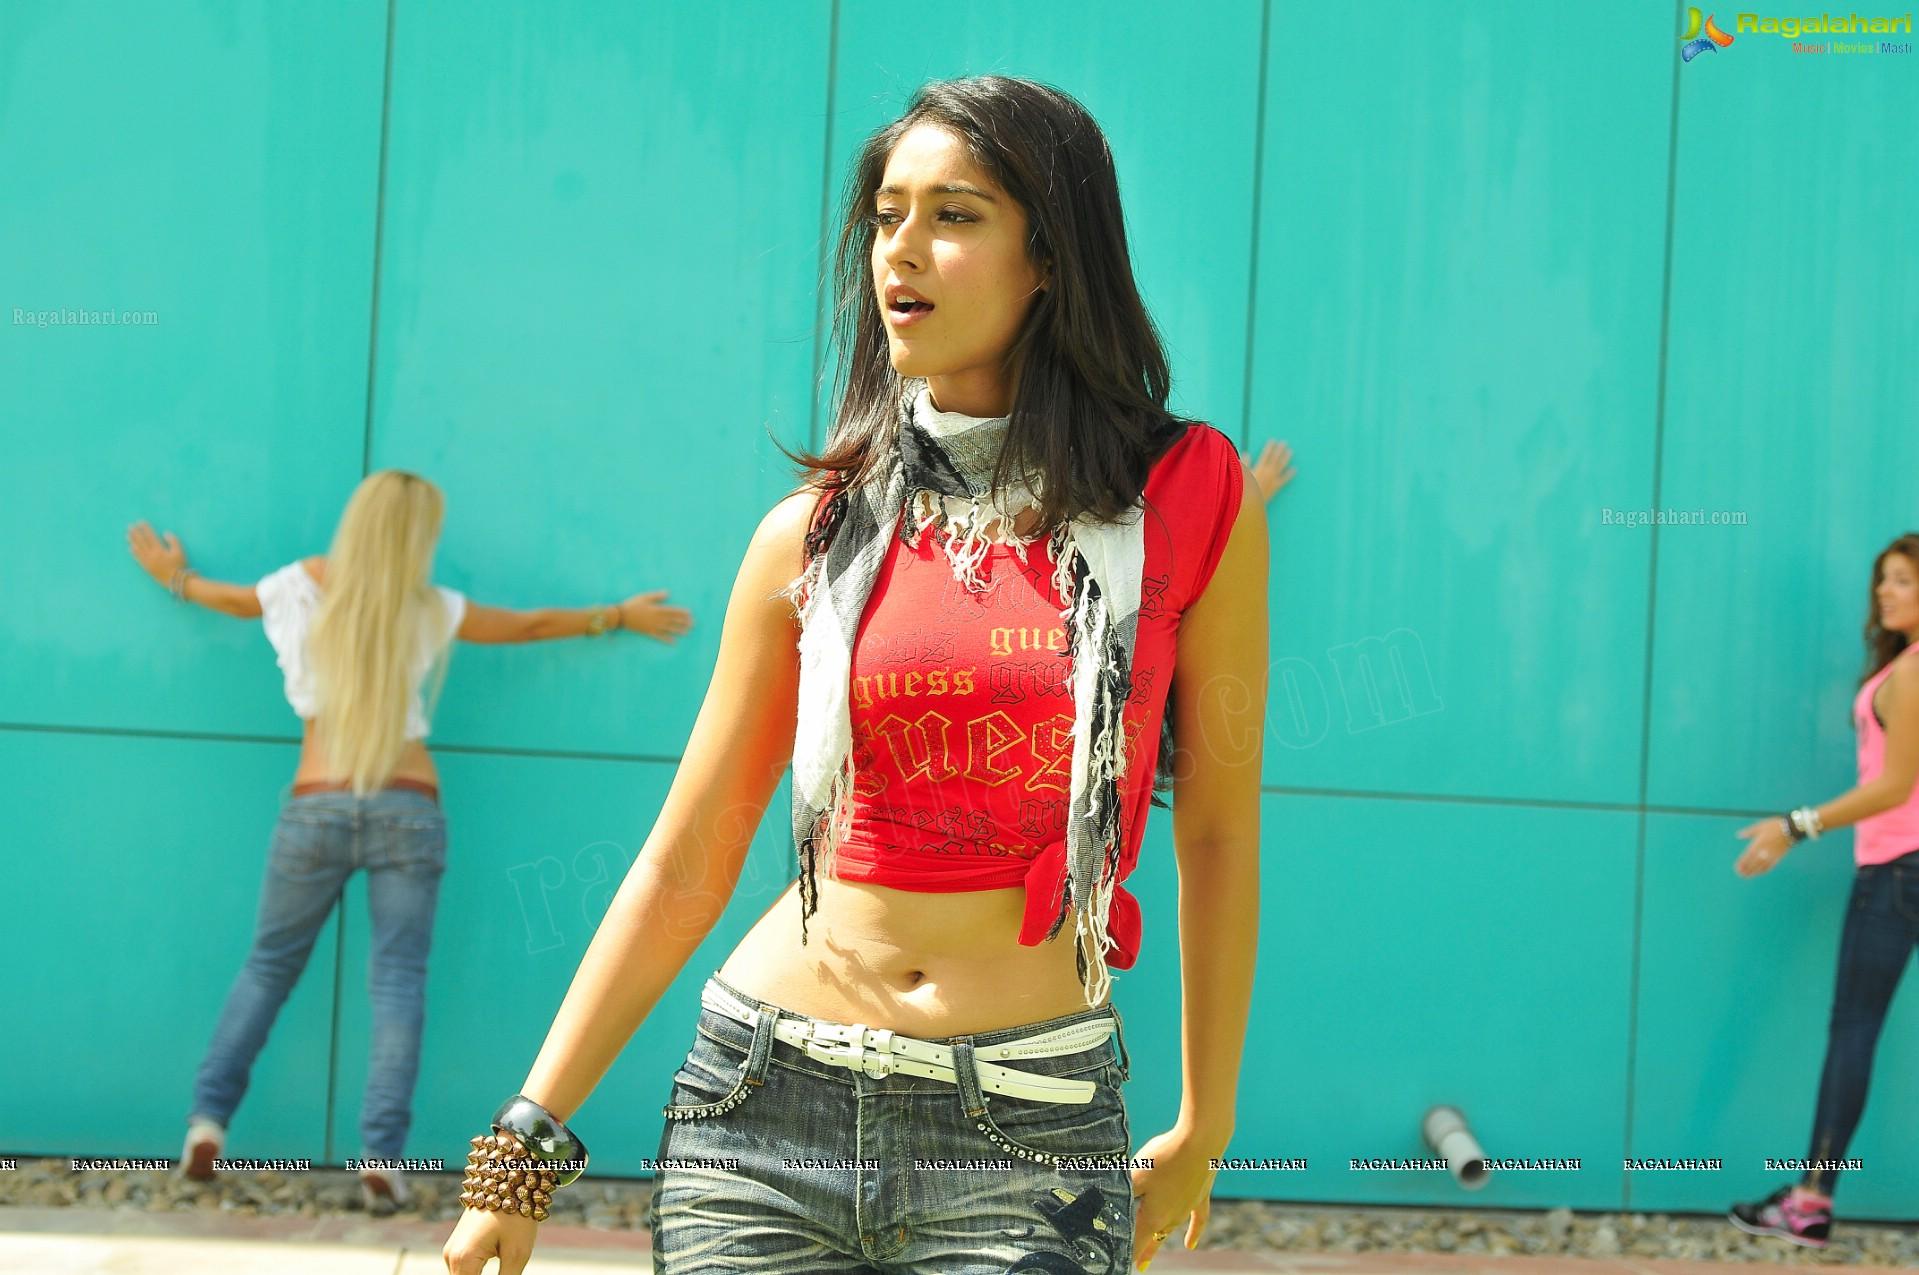 Gorgeous Actress Ileana in Midriff Dress - High Definition Photos